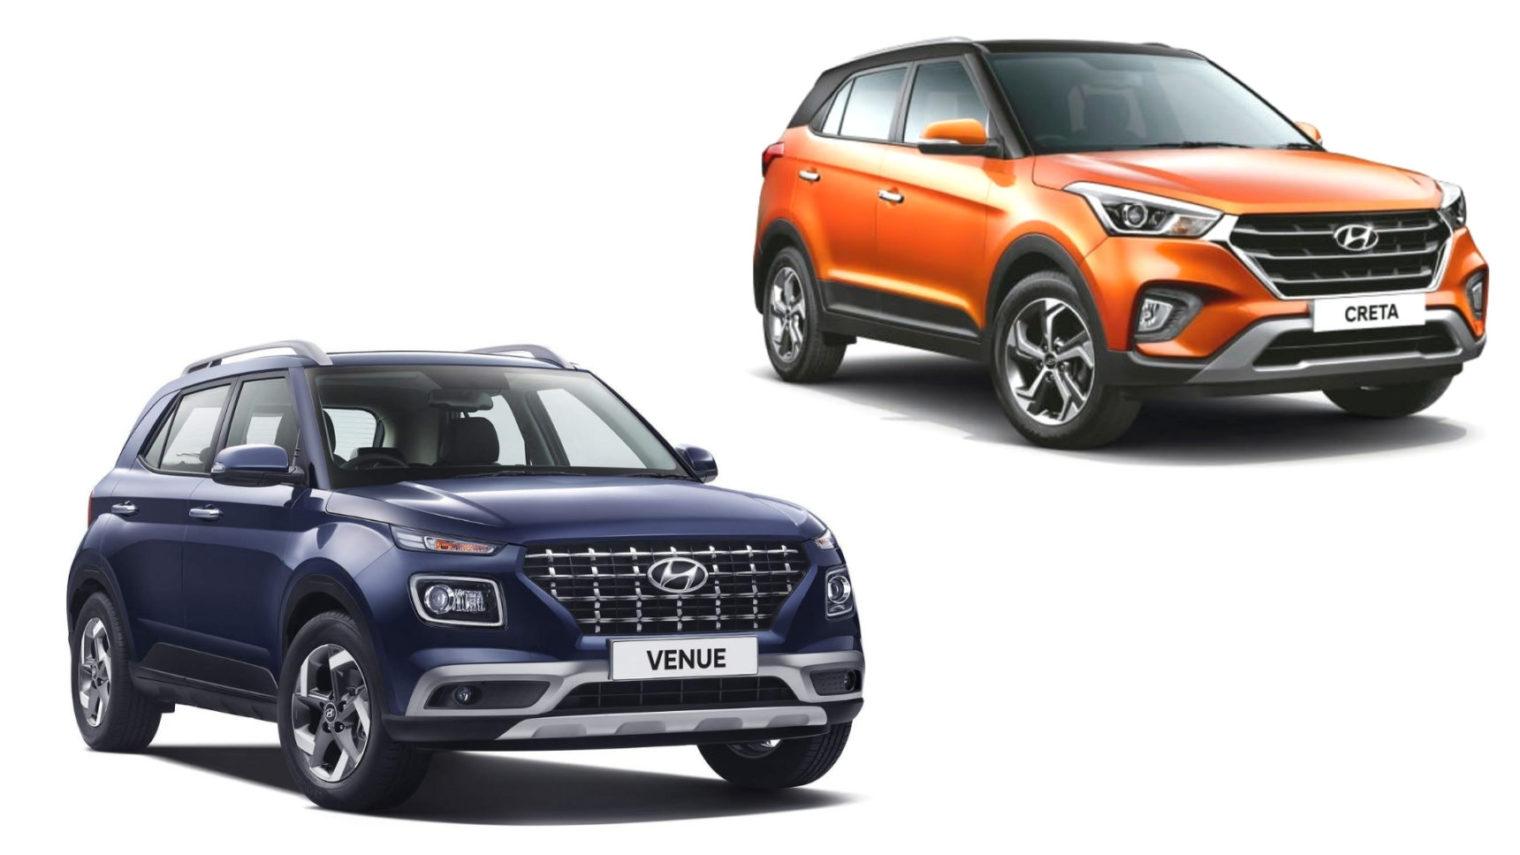 Hyundai Venue Vs Hyundai Creta - Which One To Choose?